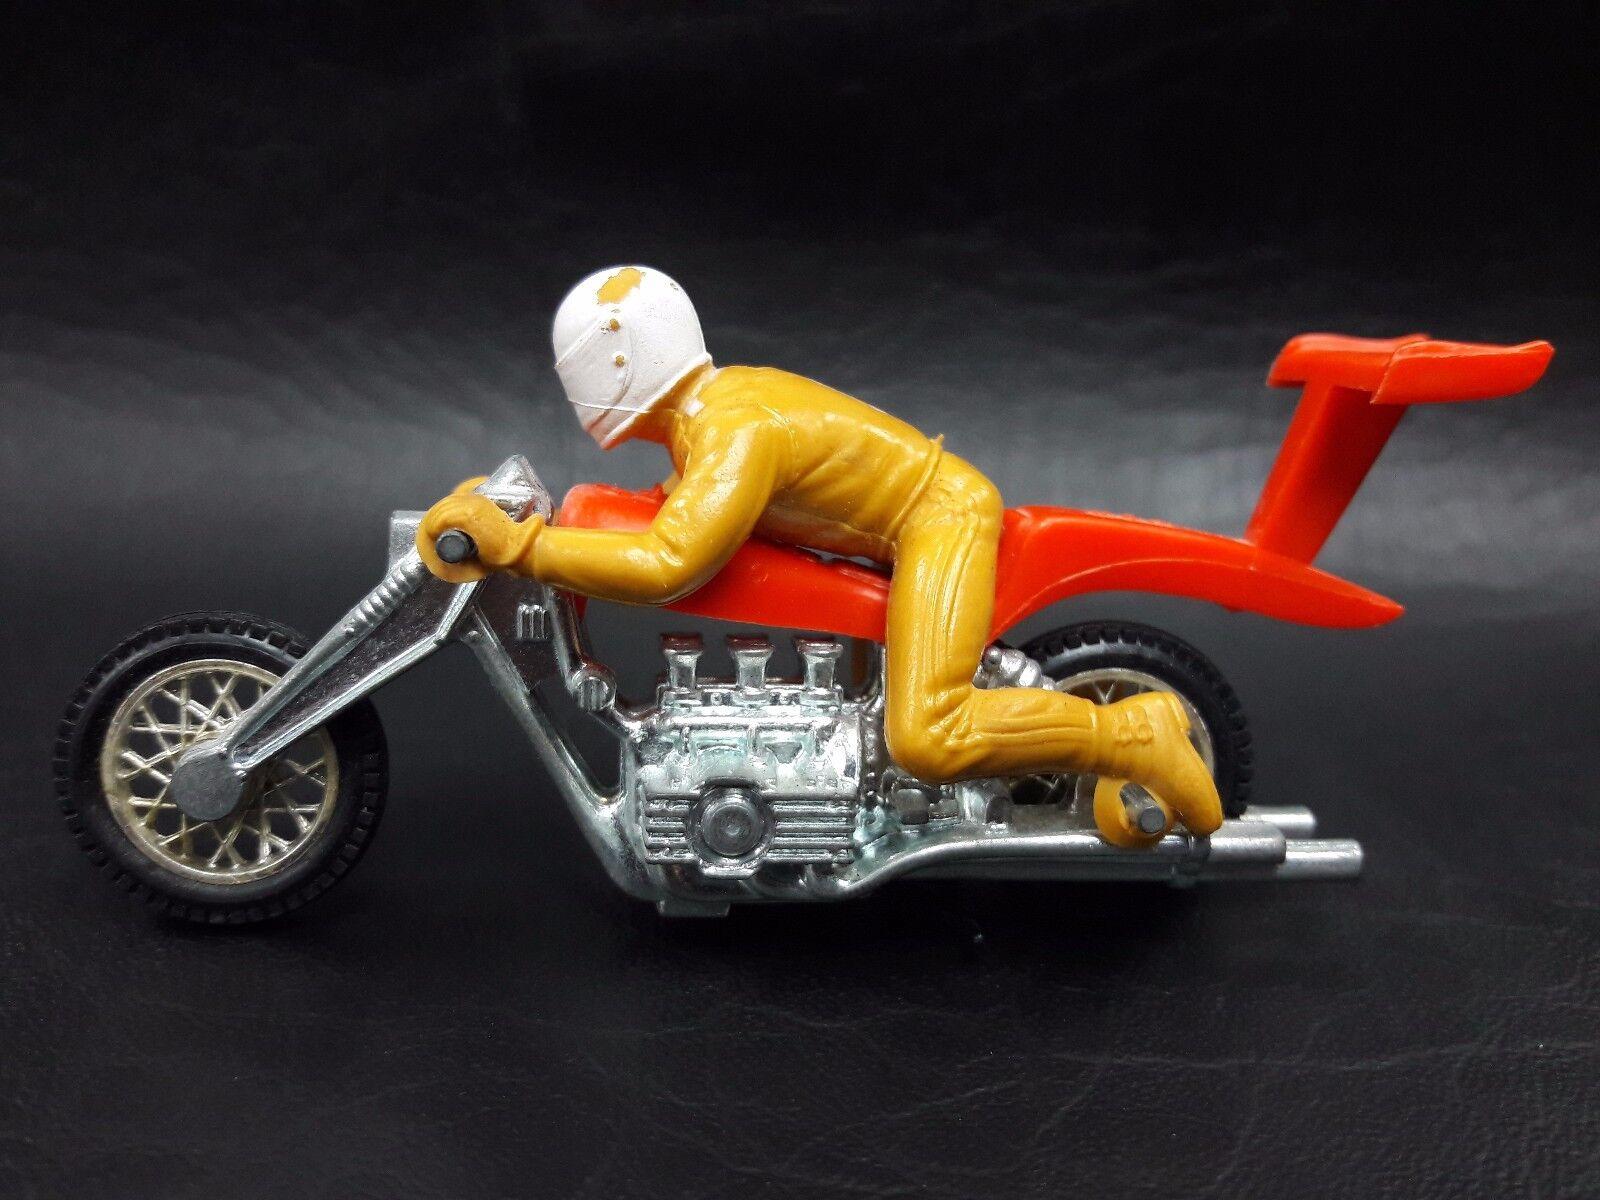 Vintage Moto rrrumblers Juguete rossoline alta Braddom W Rider